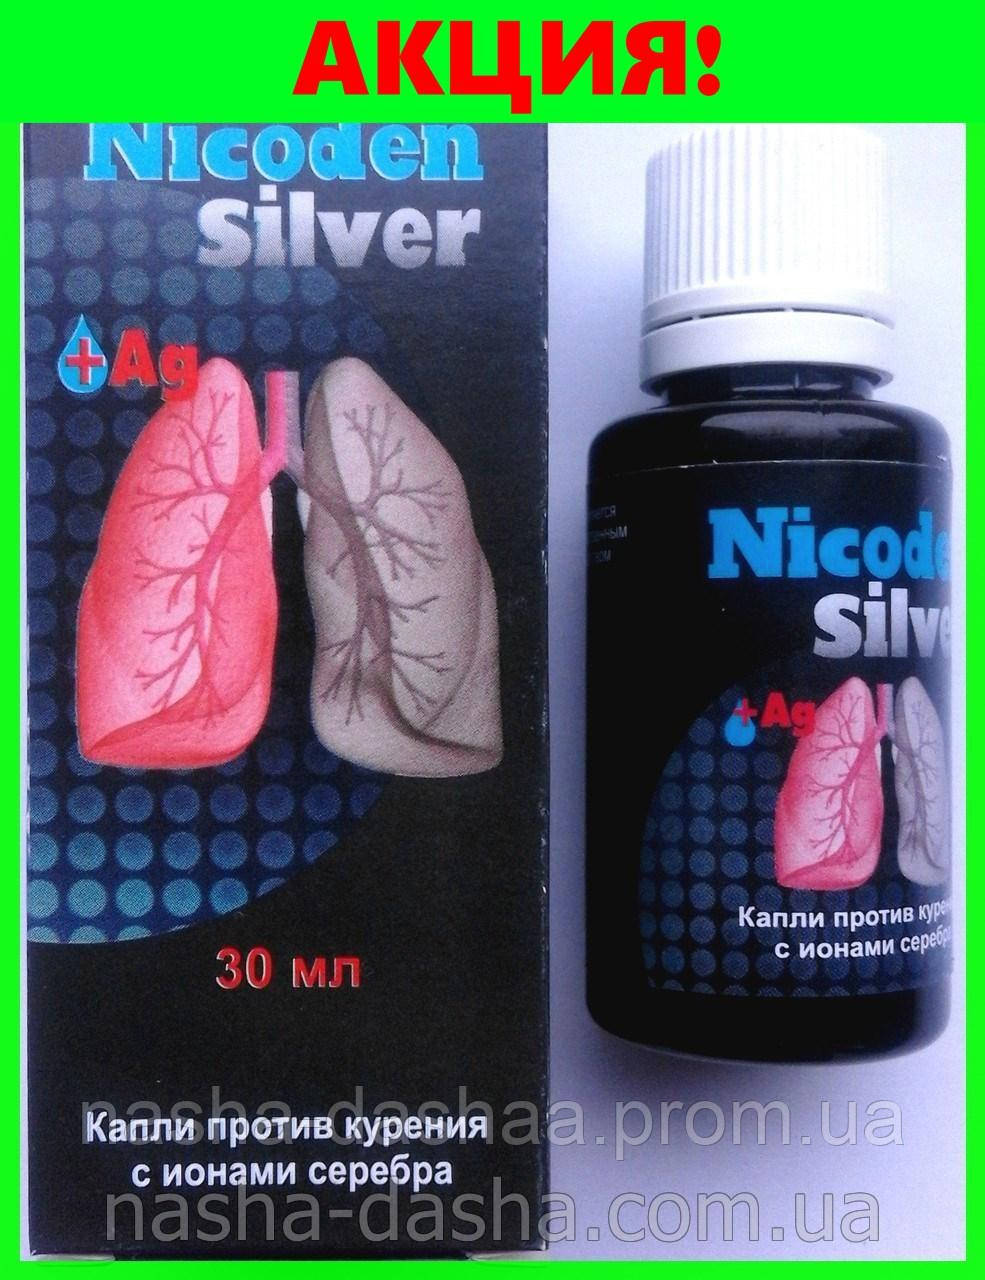 Nicoden Silver - Капли от курения с ионами серебра (Никоден Силвер)